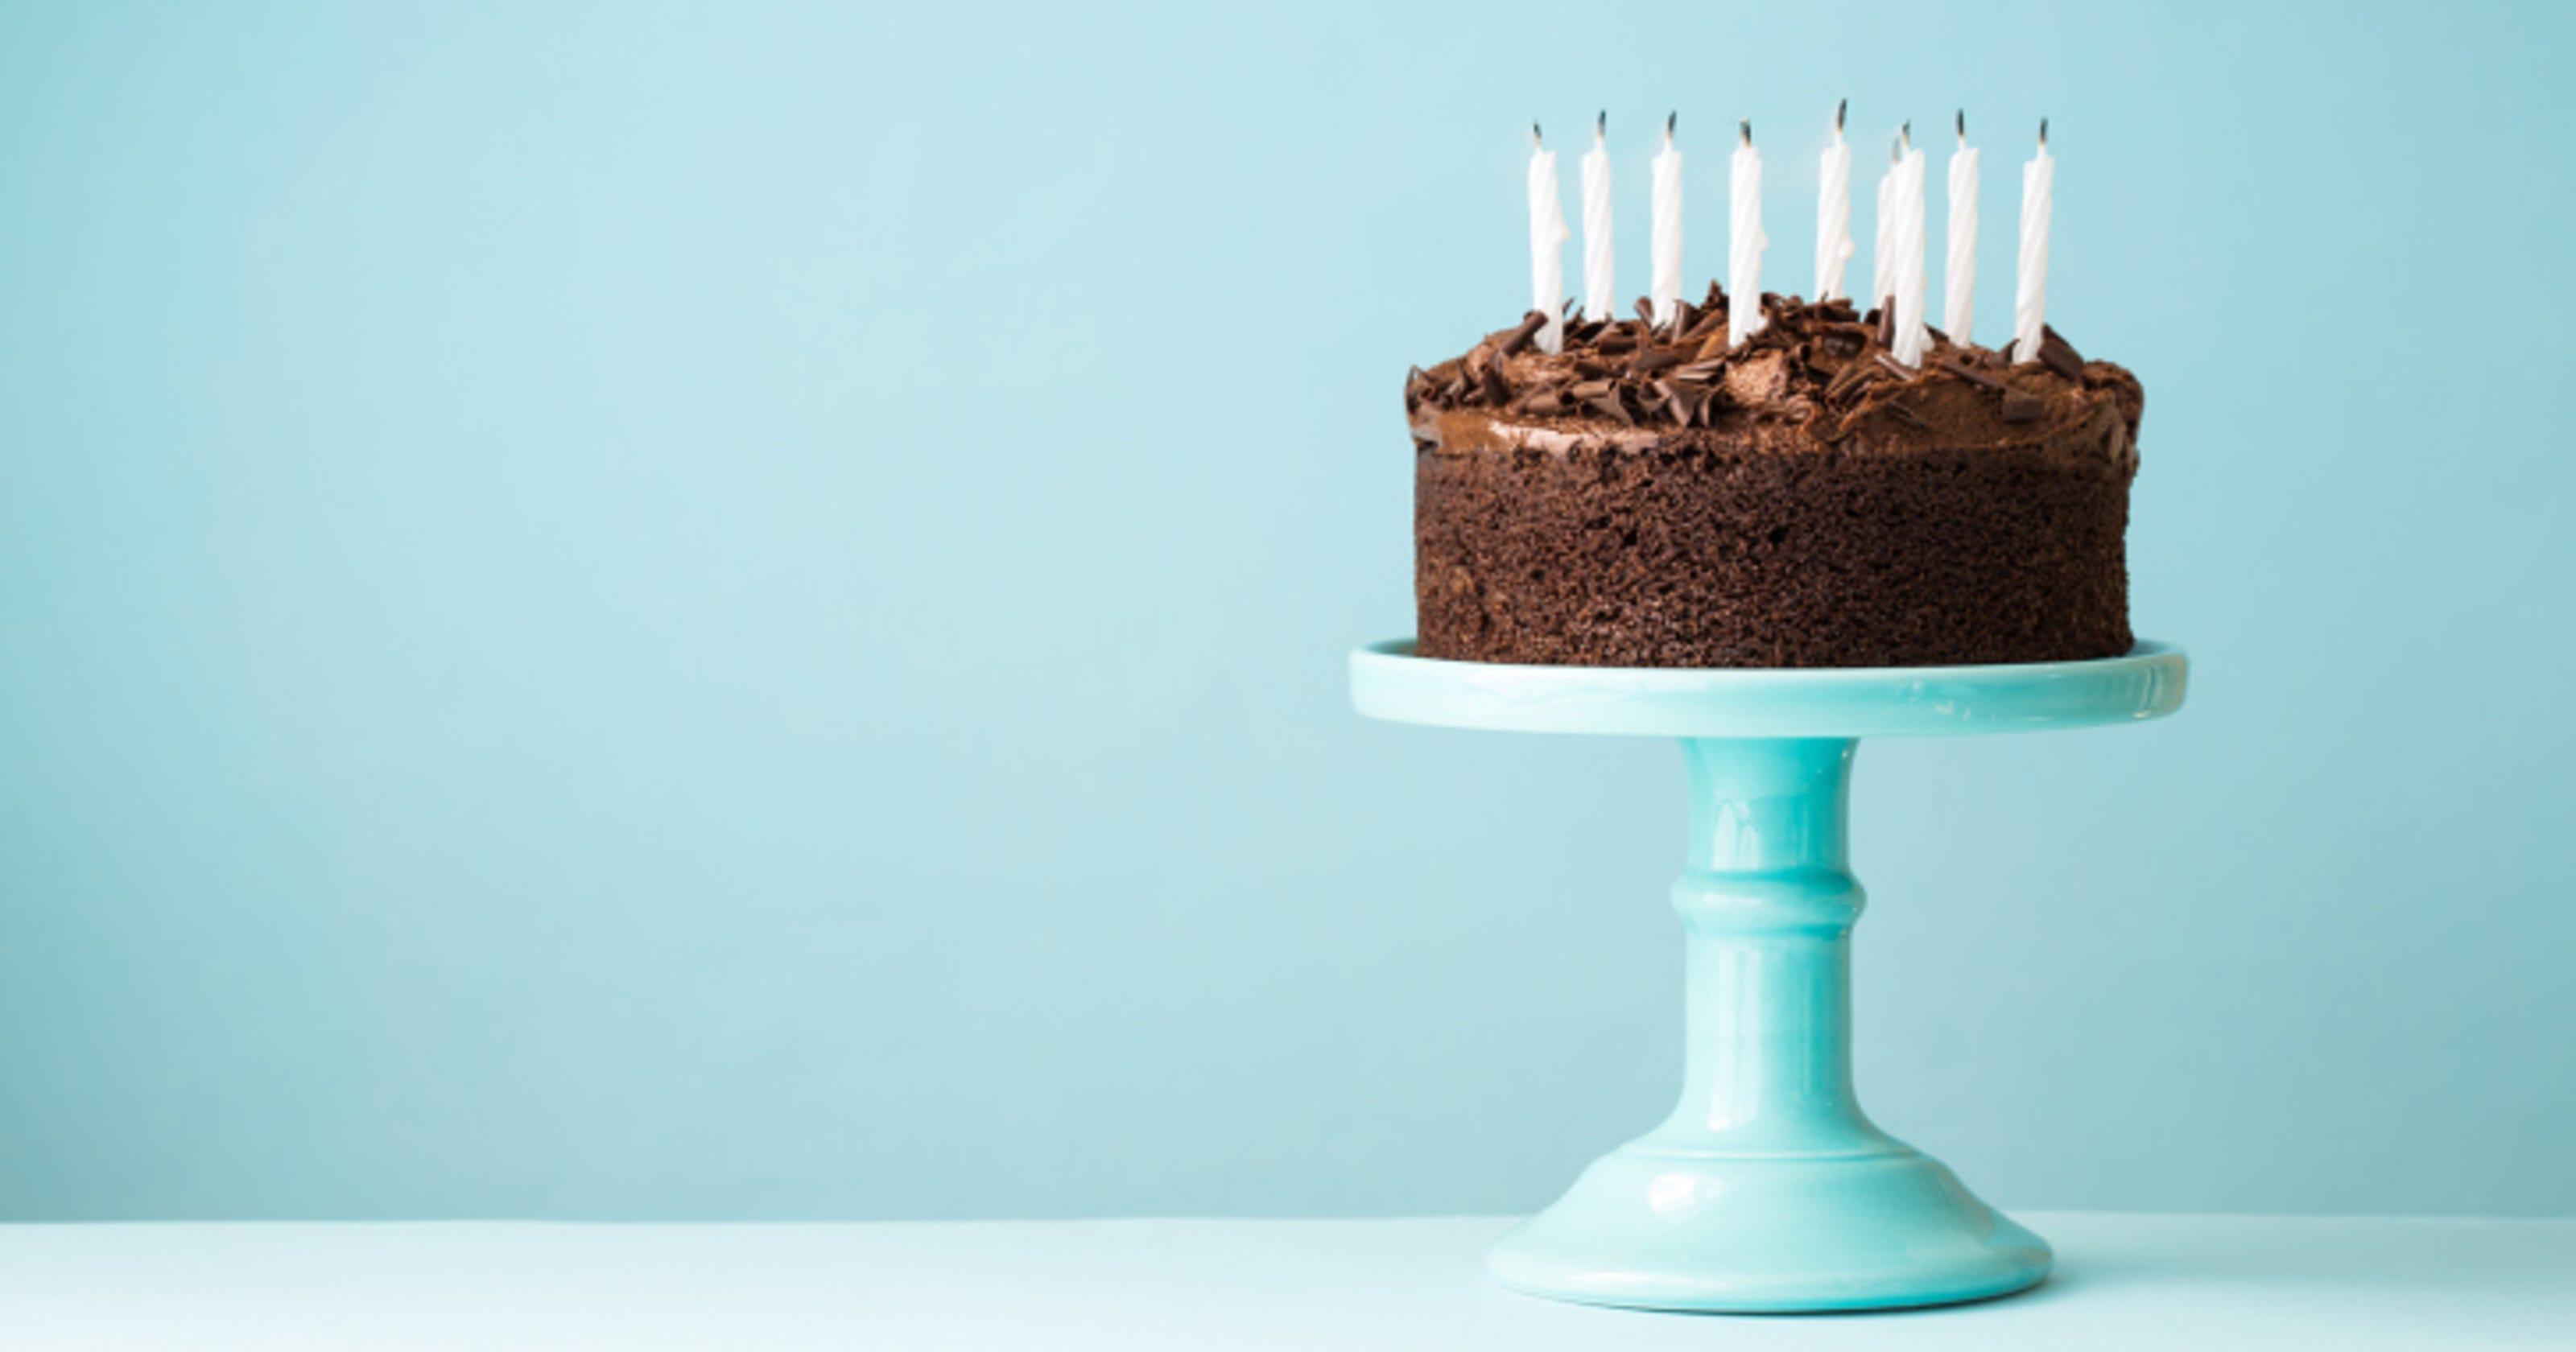 Meijer Customers Cake Photo Story Goes Viral